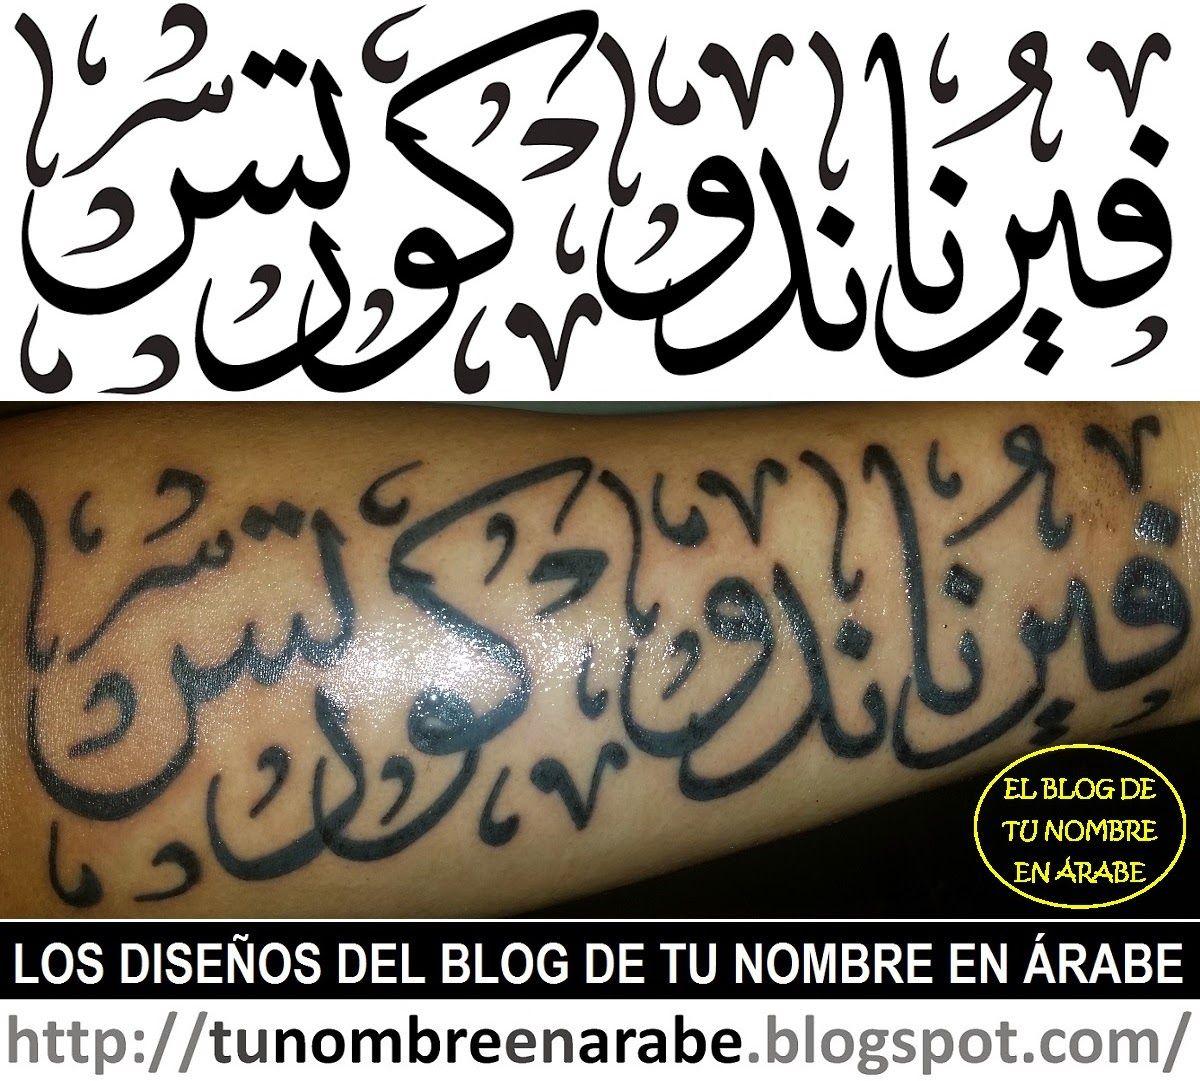 Diseos de Tatuajes nombres en Arabe Tu nombre en rabe